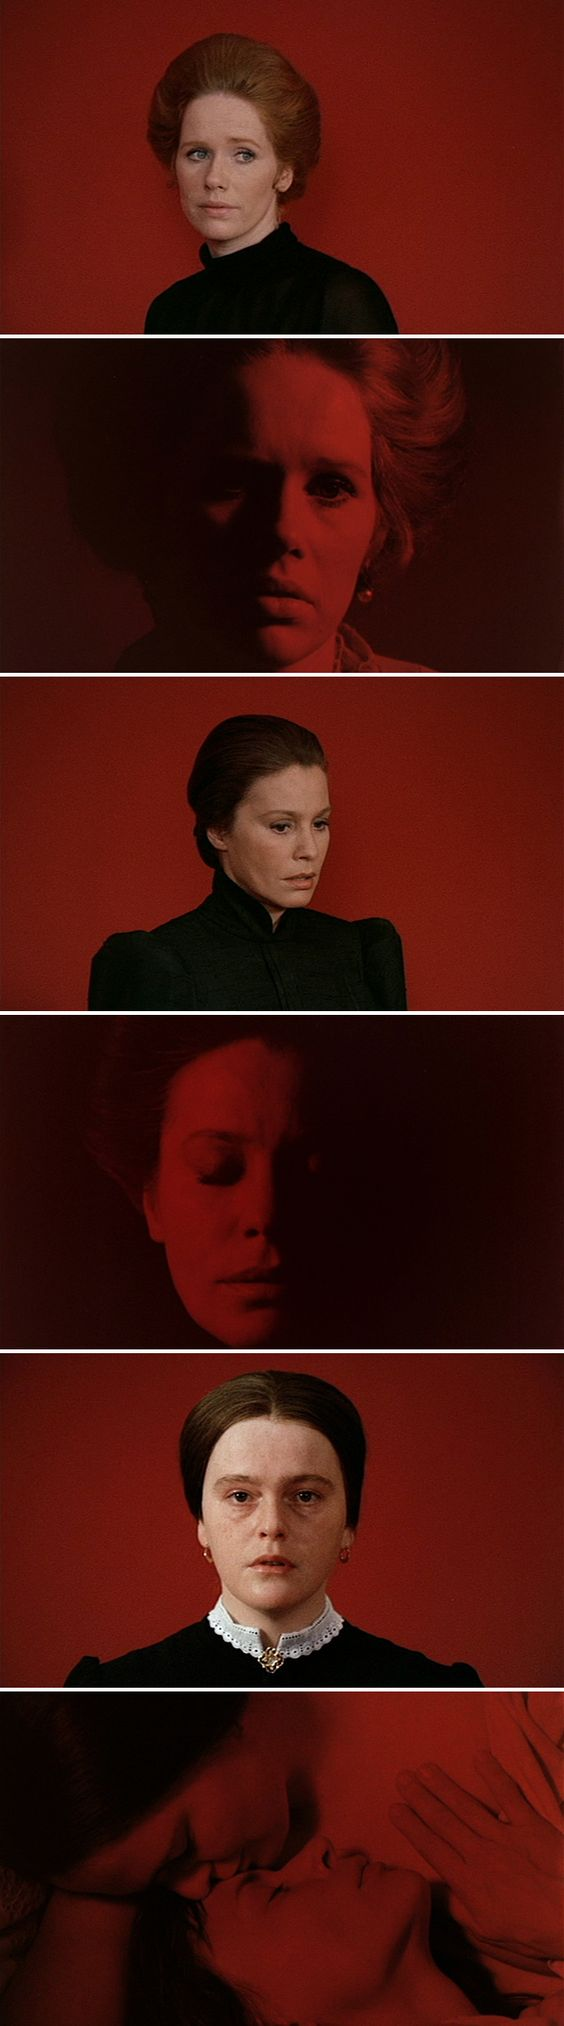 Ingmar Bergman - Cries and Whispers.